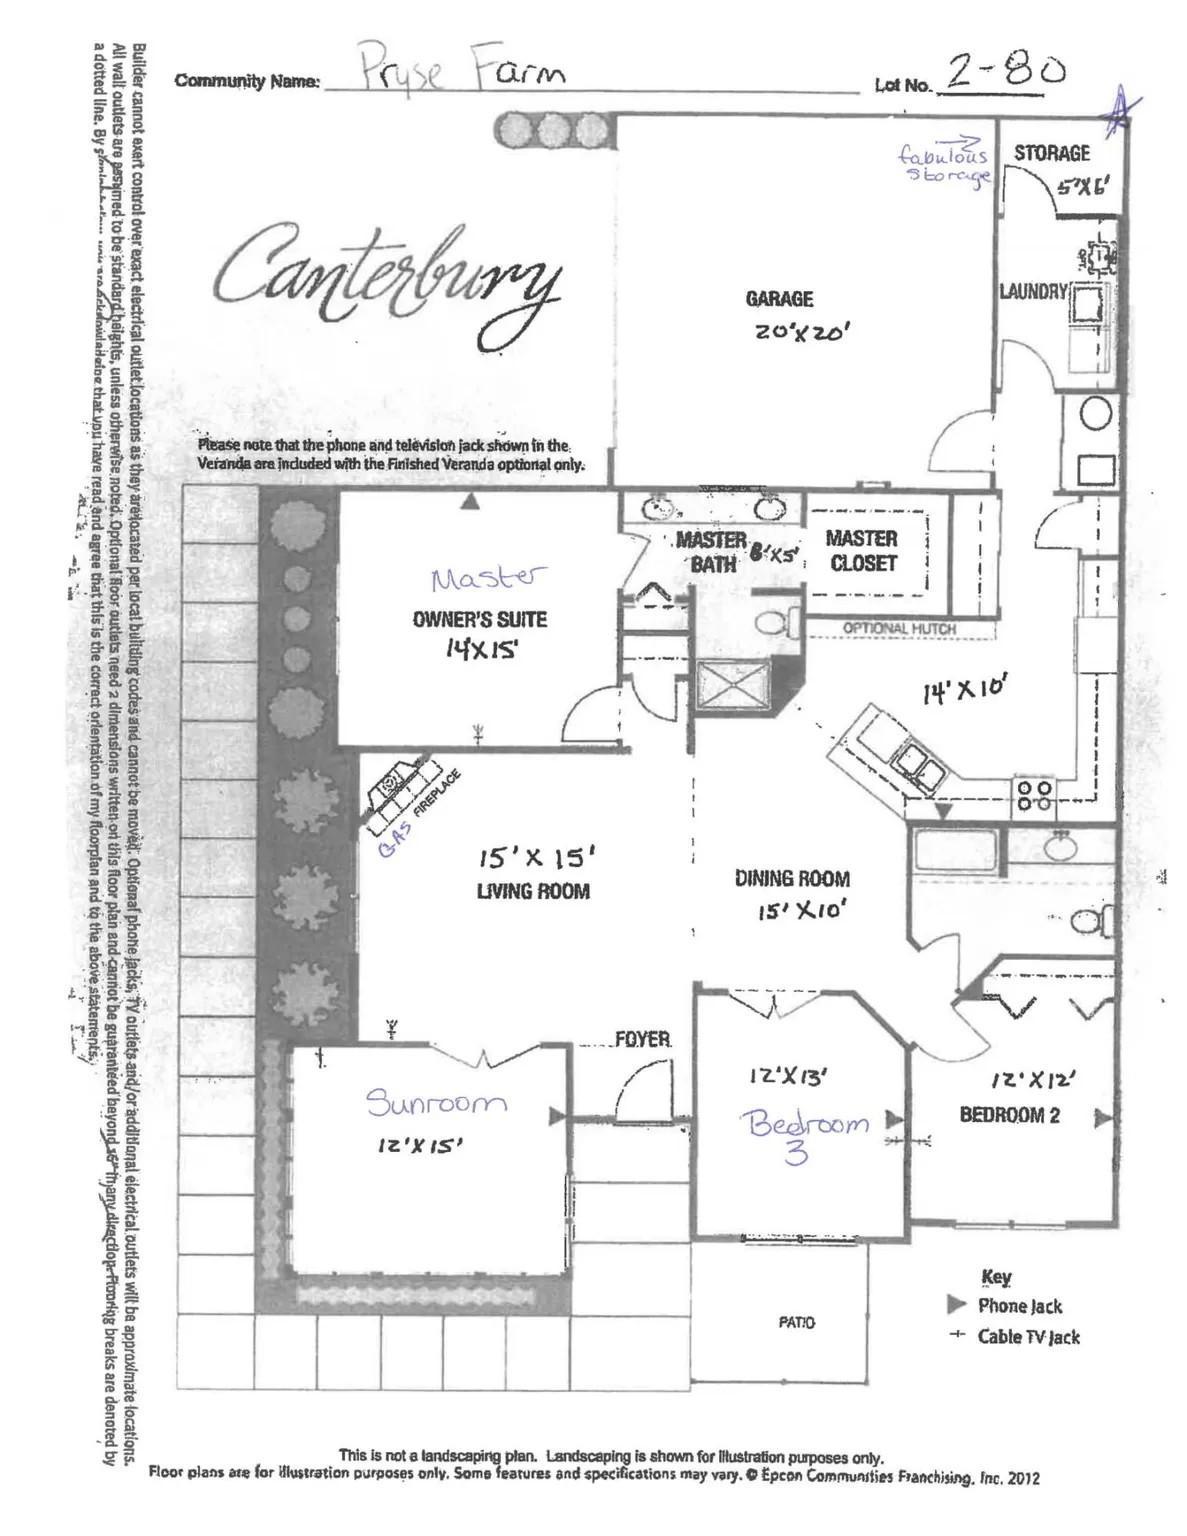 Pryse Farm Floor Plan